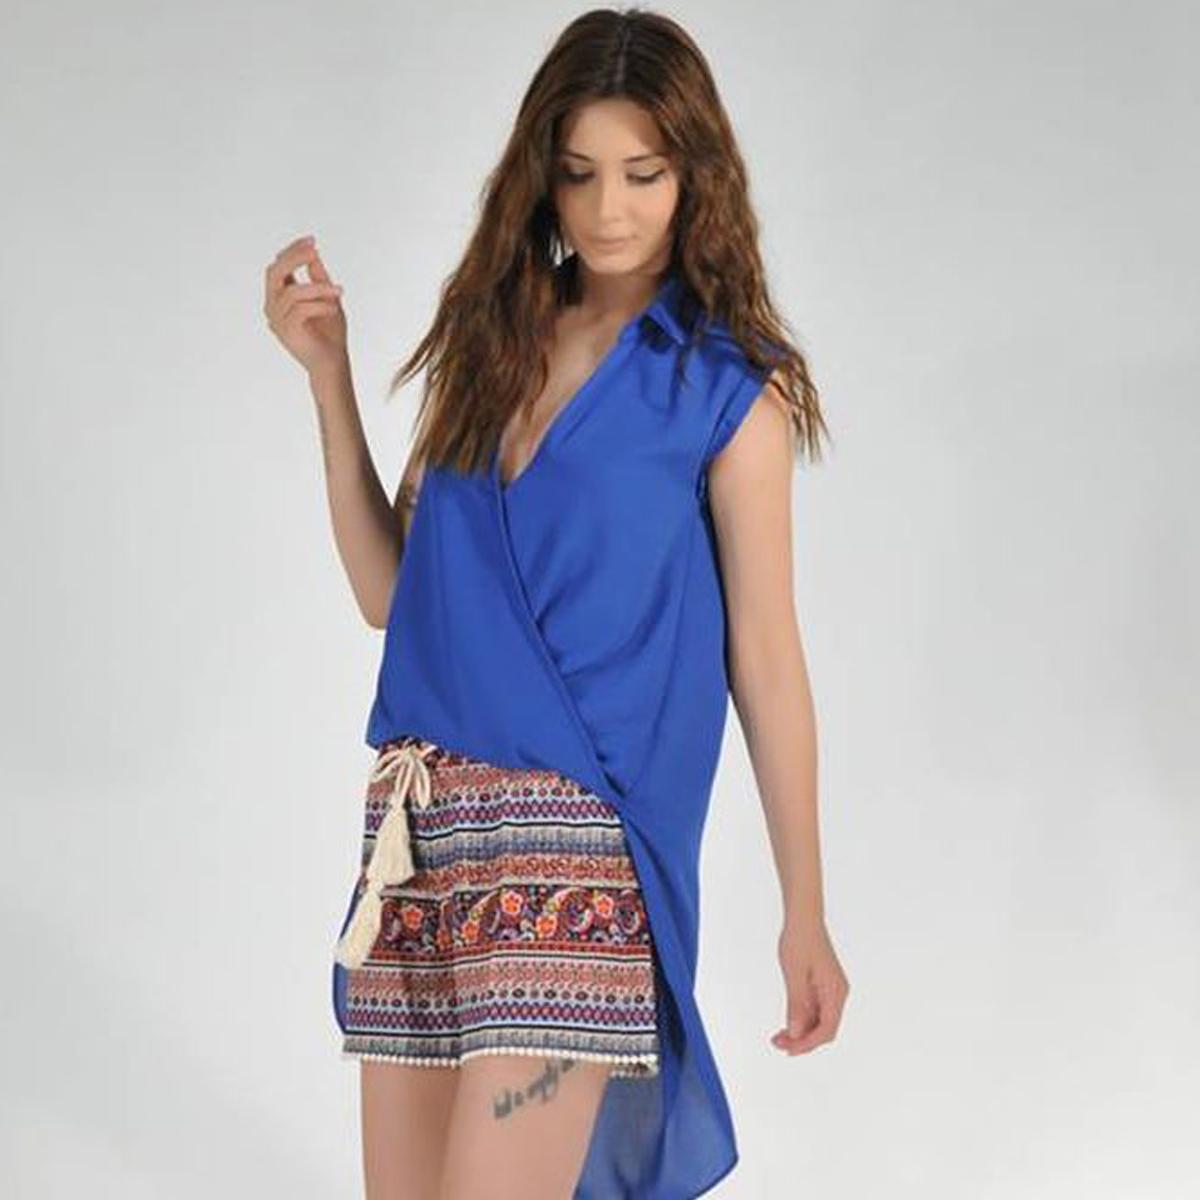 b97bf6b165fe Μπλουζοπουκάμισο κρουαζέ μακρύ πίσω - Dressme